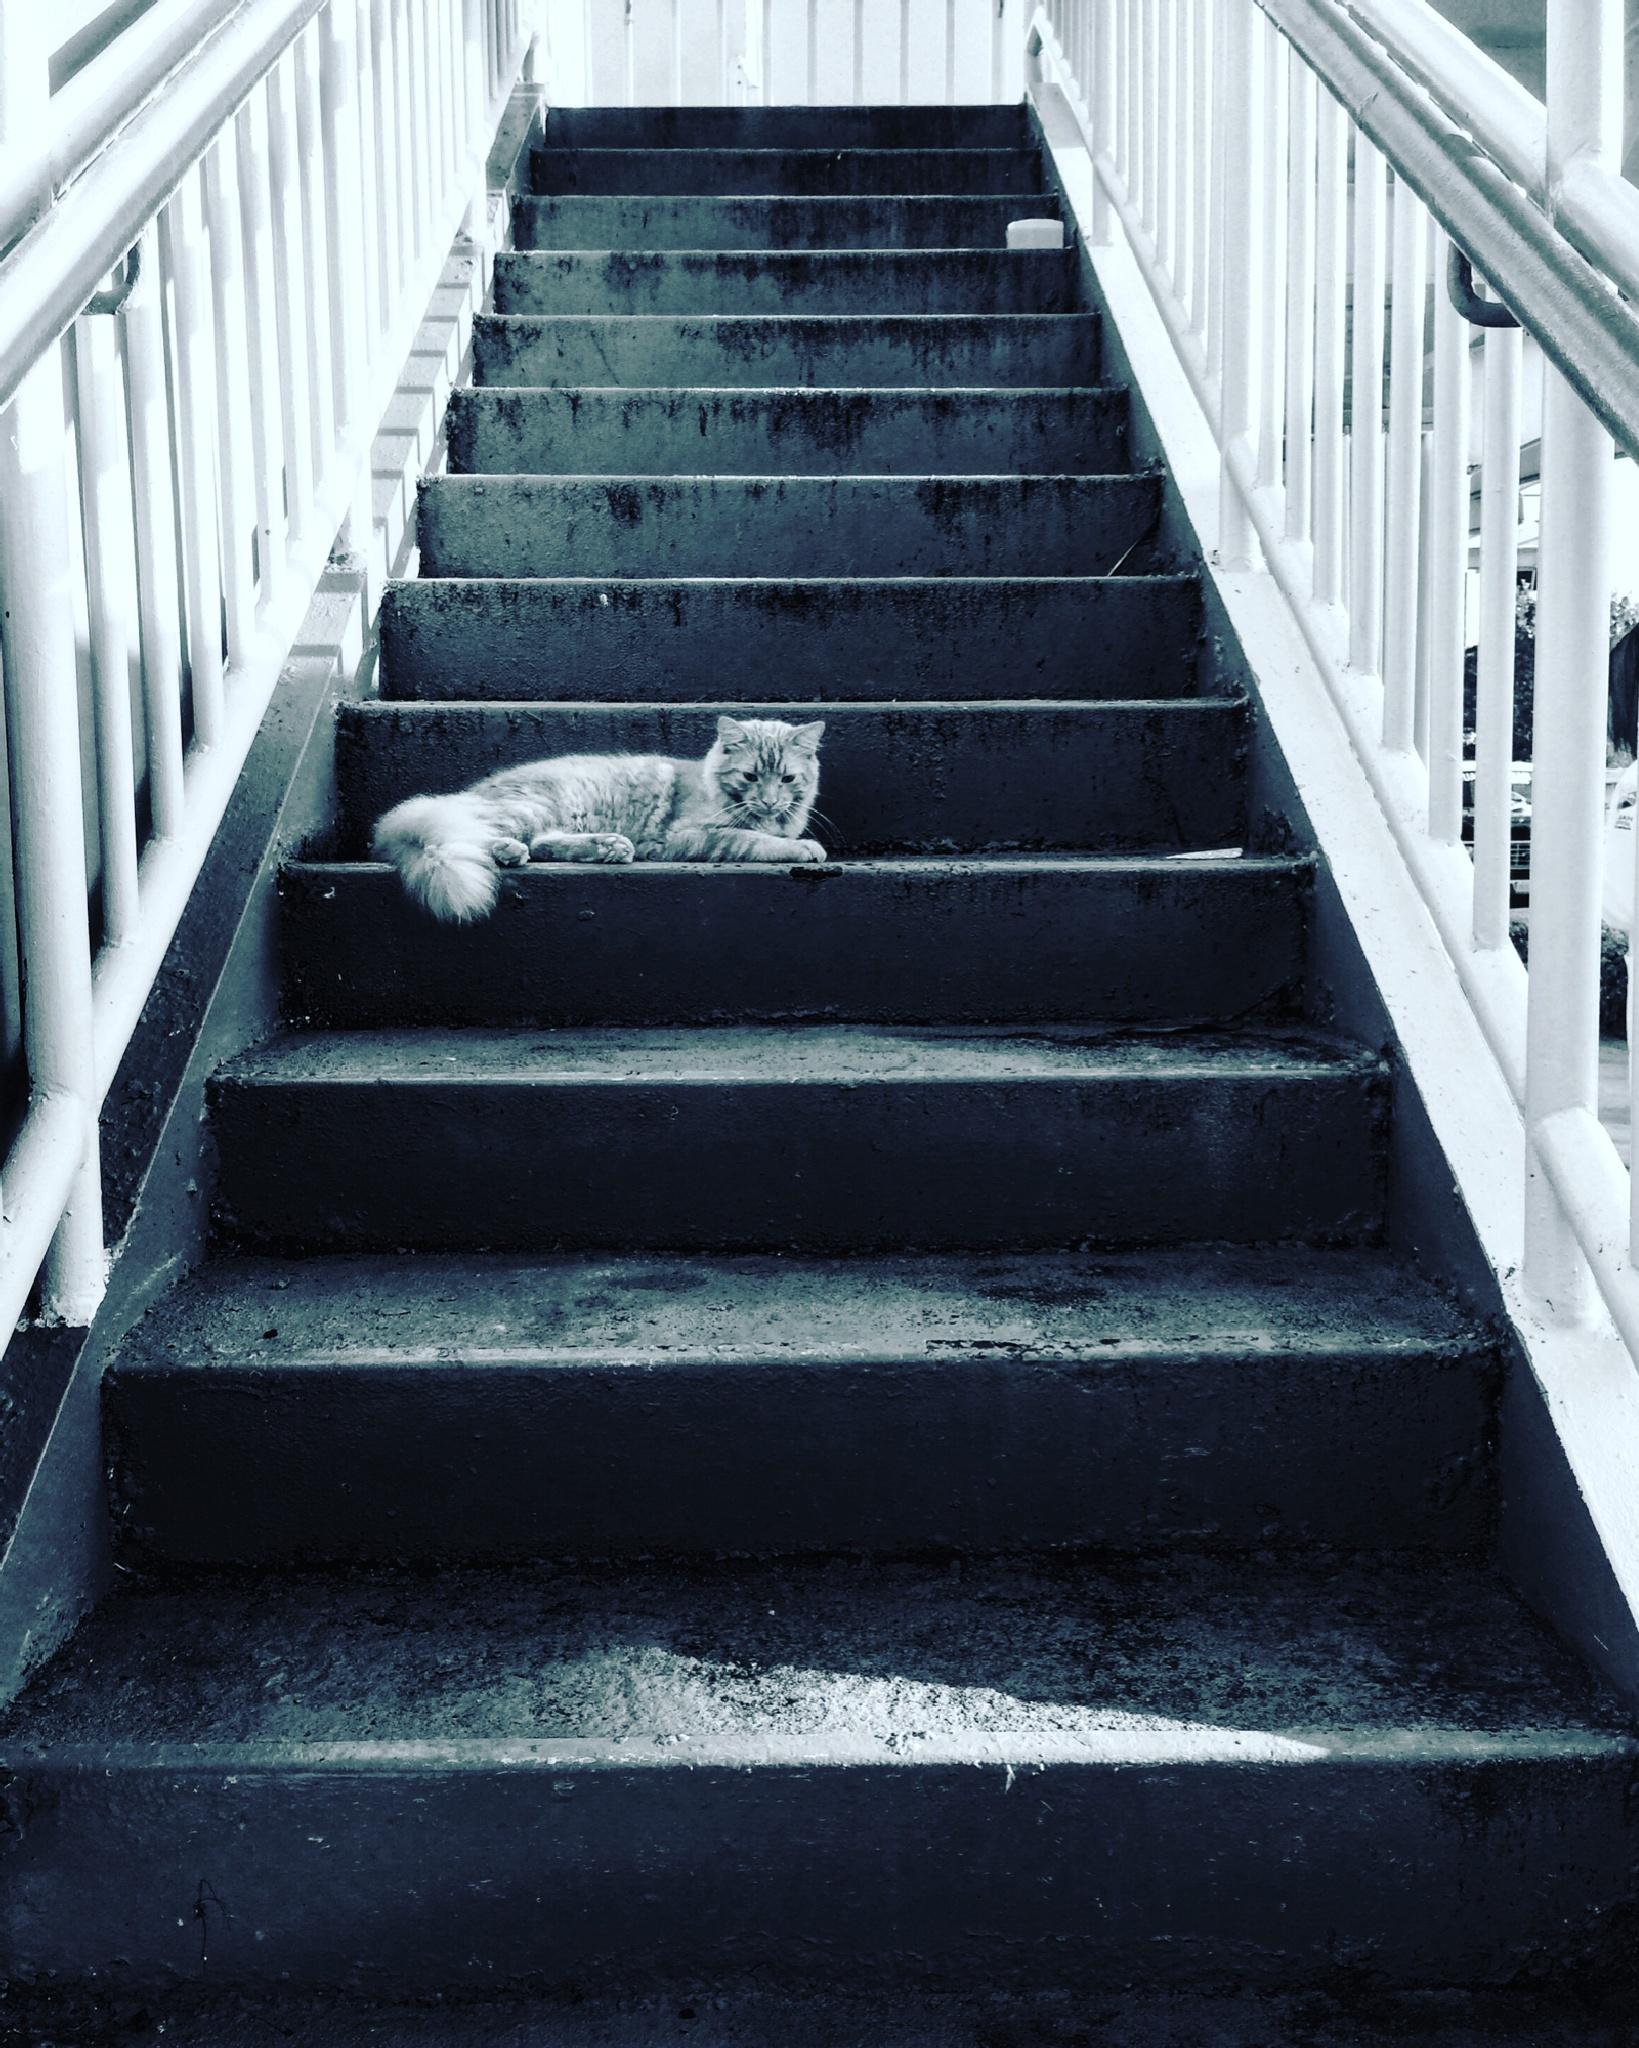 Cat on stairs by Nilda64pr